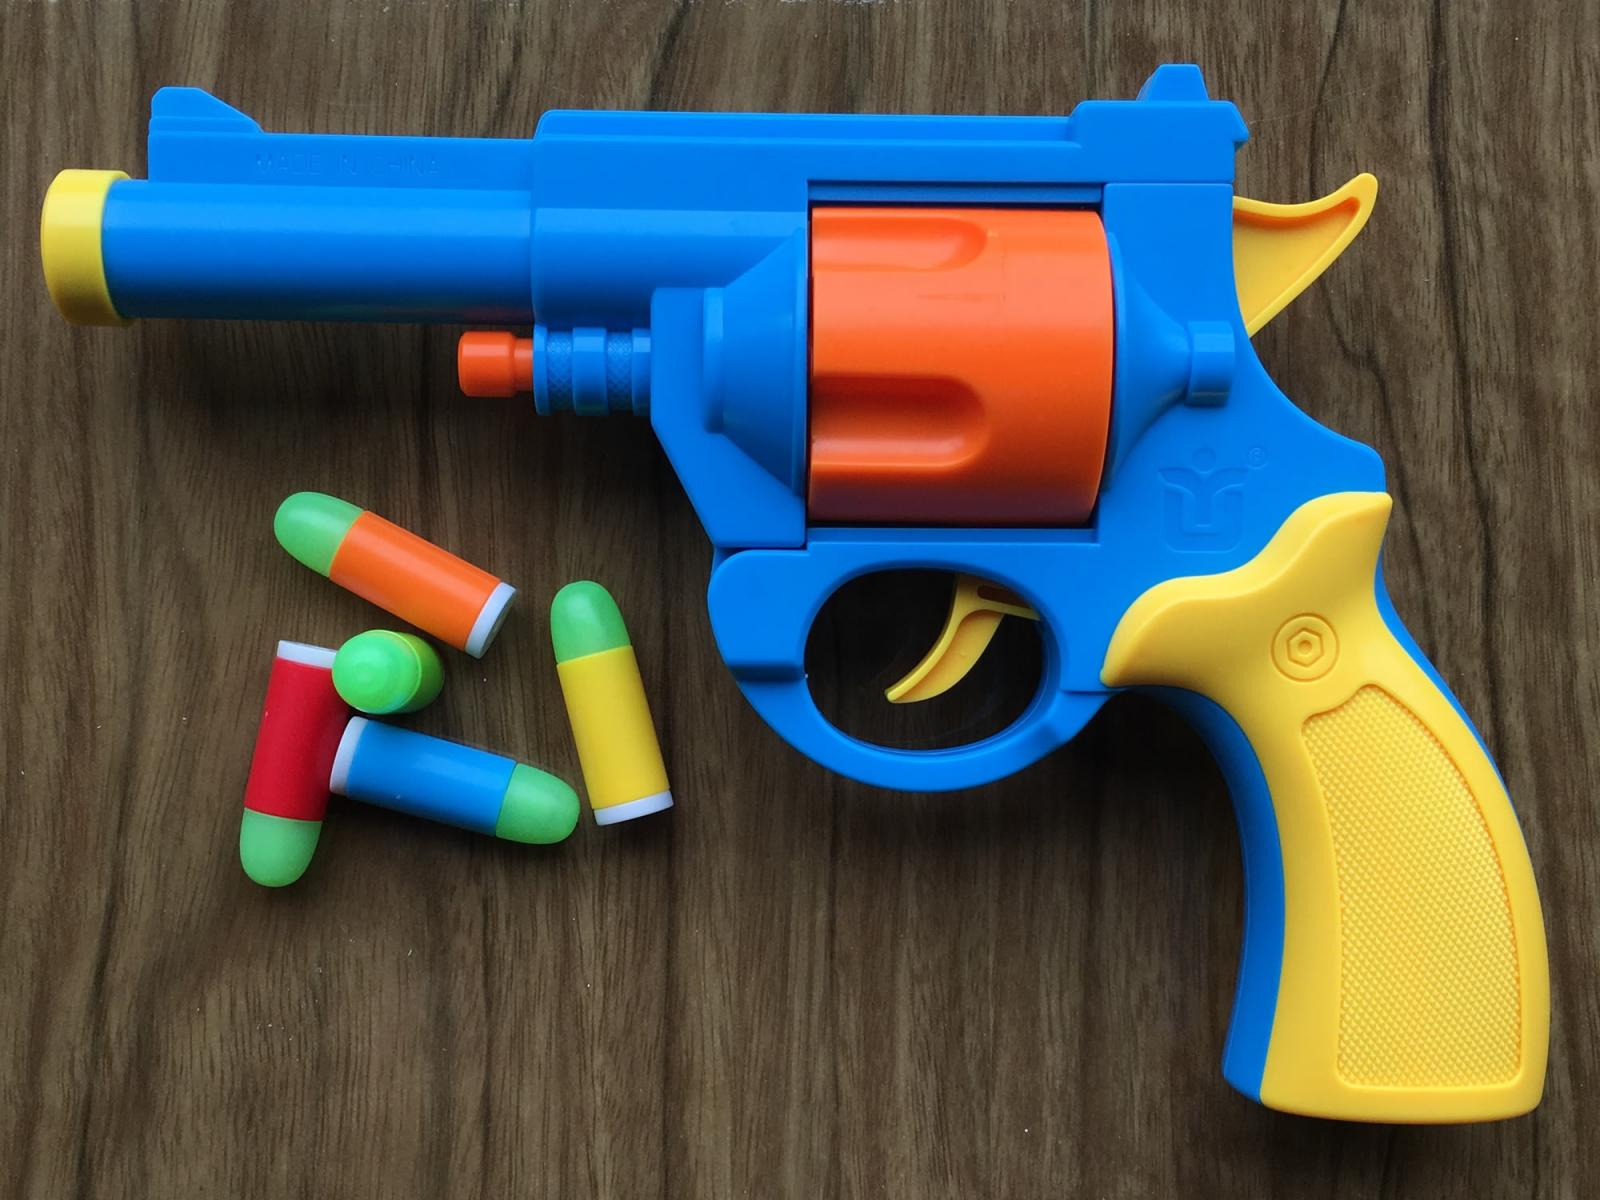 Toy Gun Twin Pack 2x M1911 Nerf Foam Dart Guns Colt 45